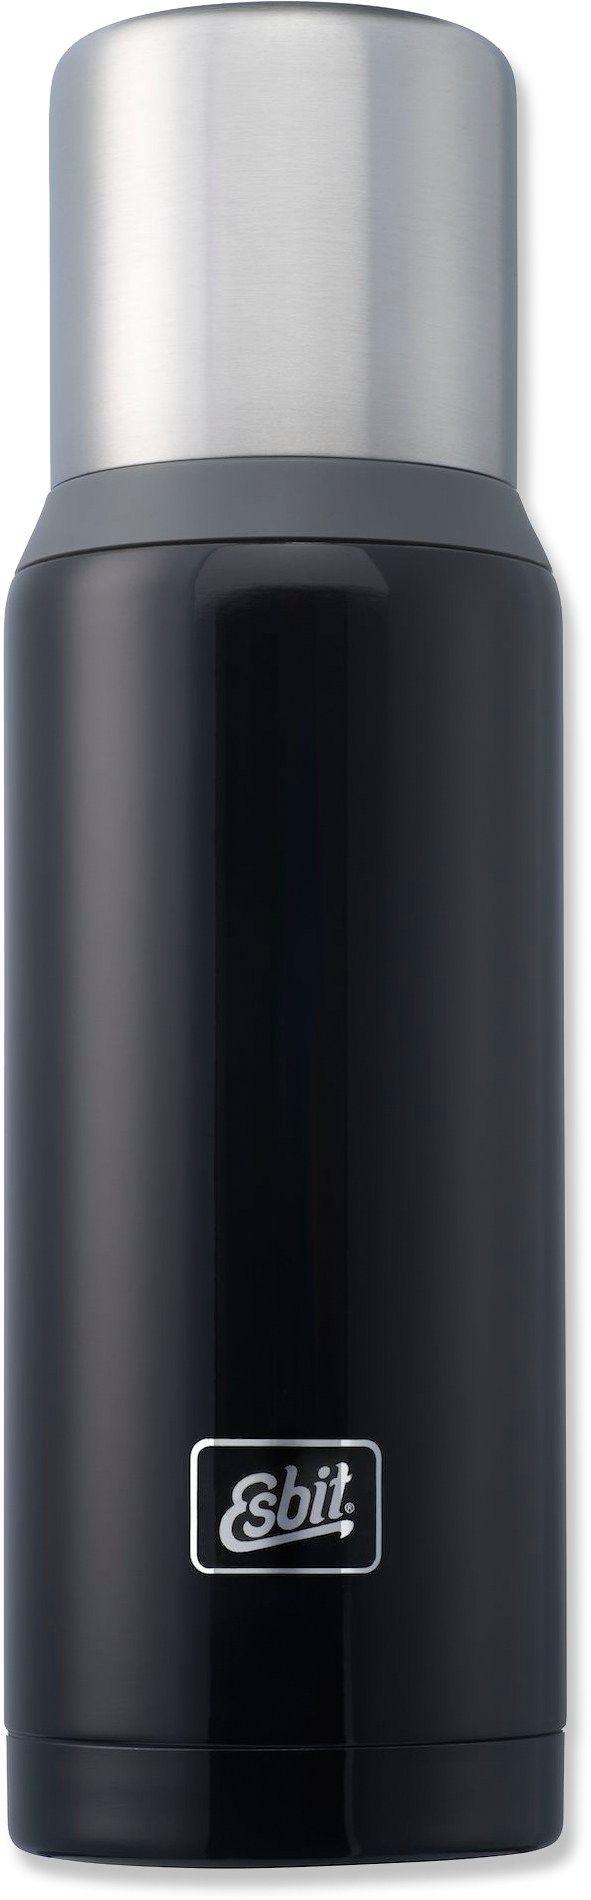 Esbit Vacuum Bottle - 32 Fl. Oz.